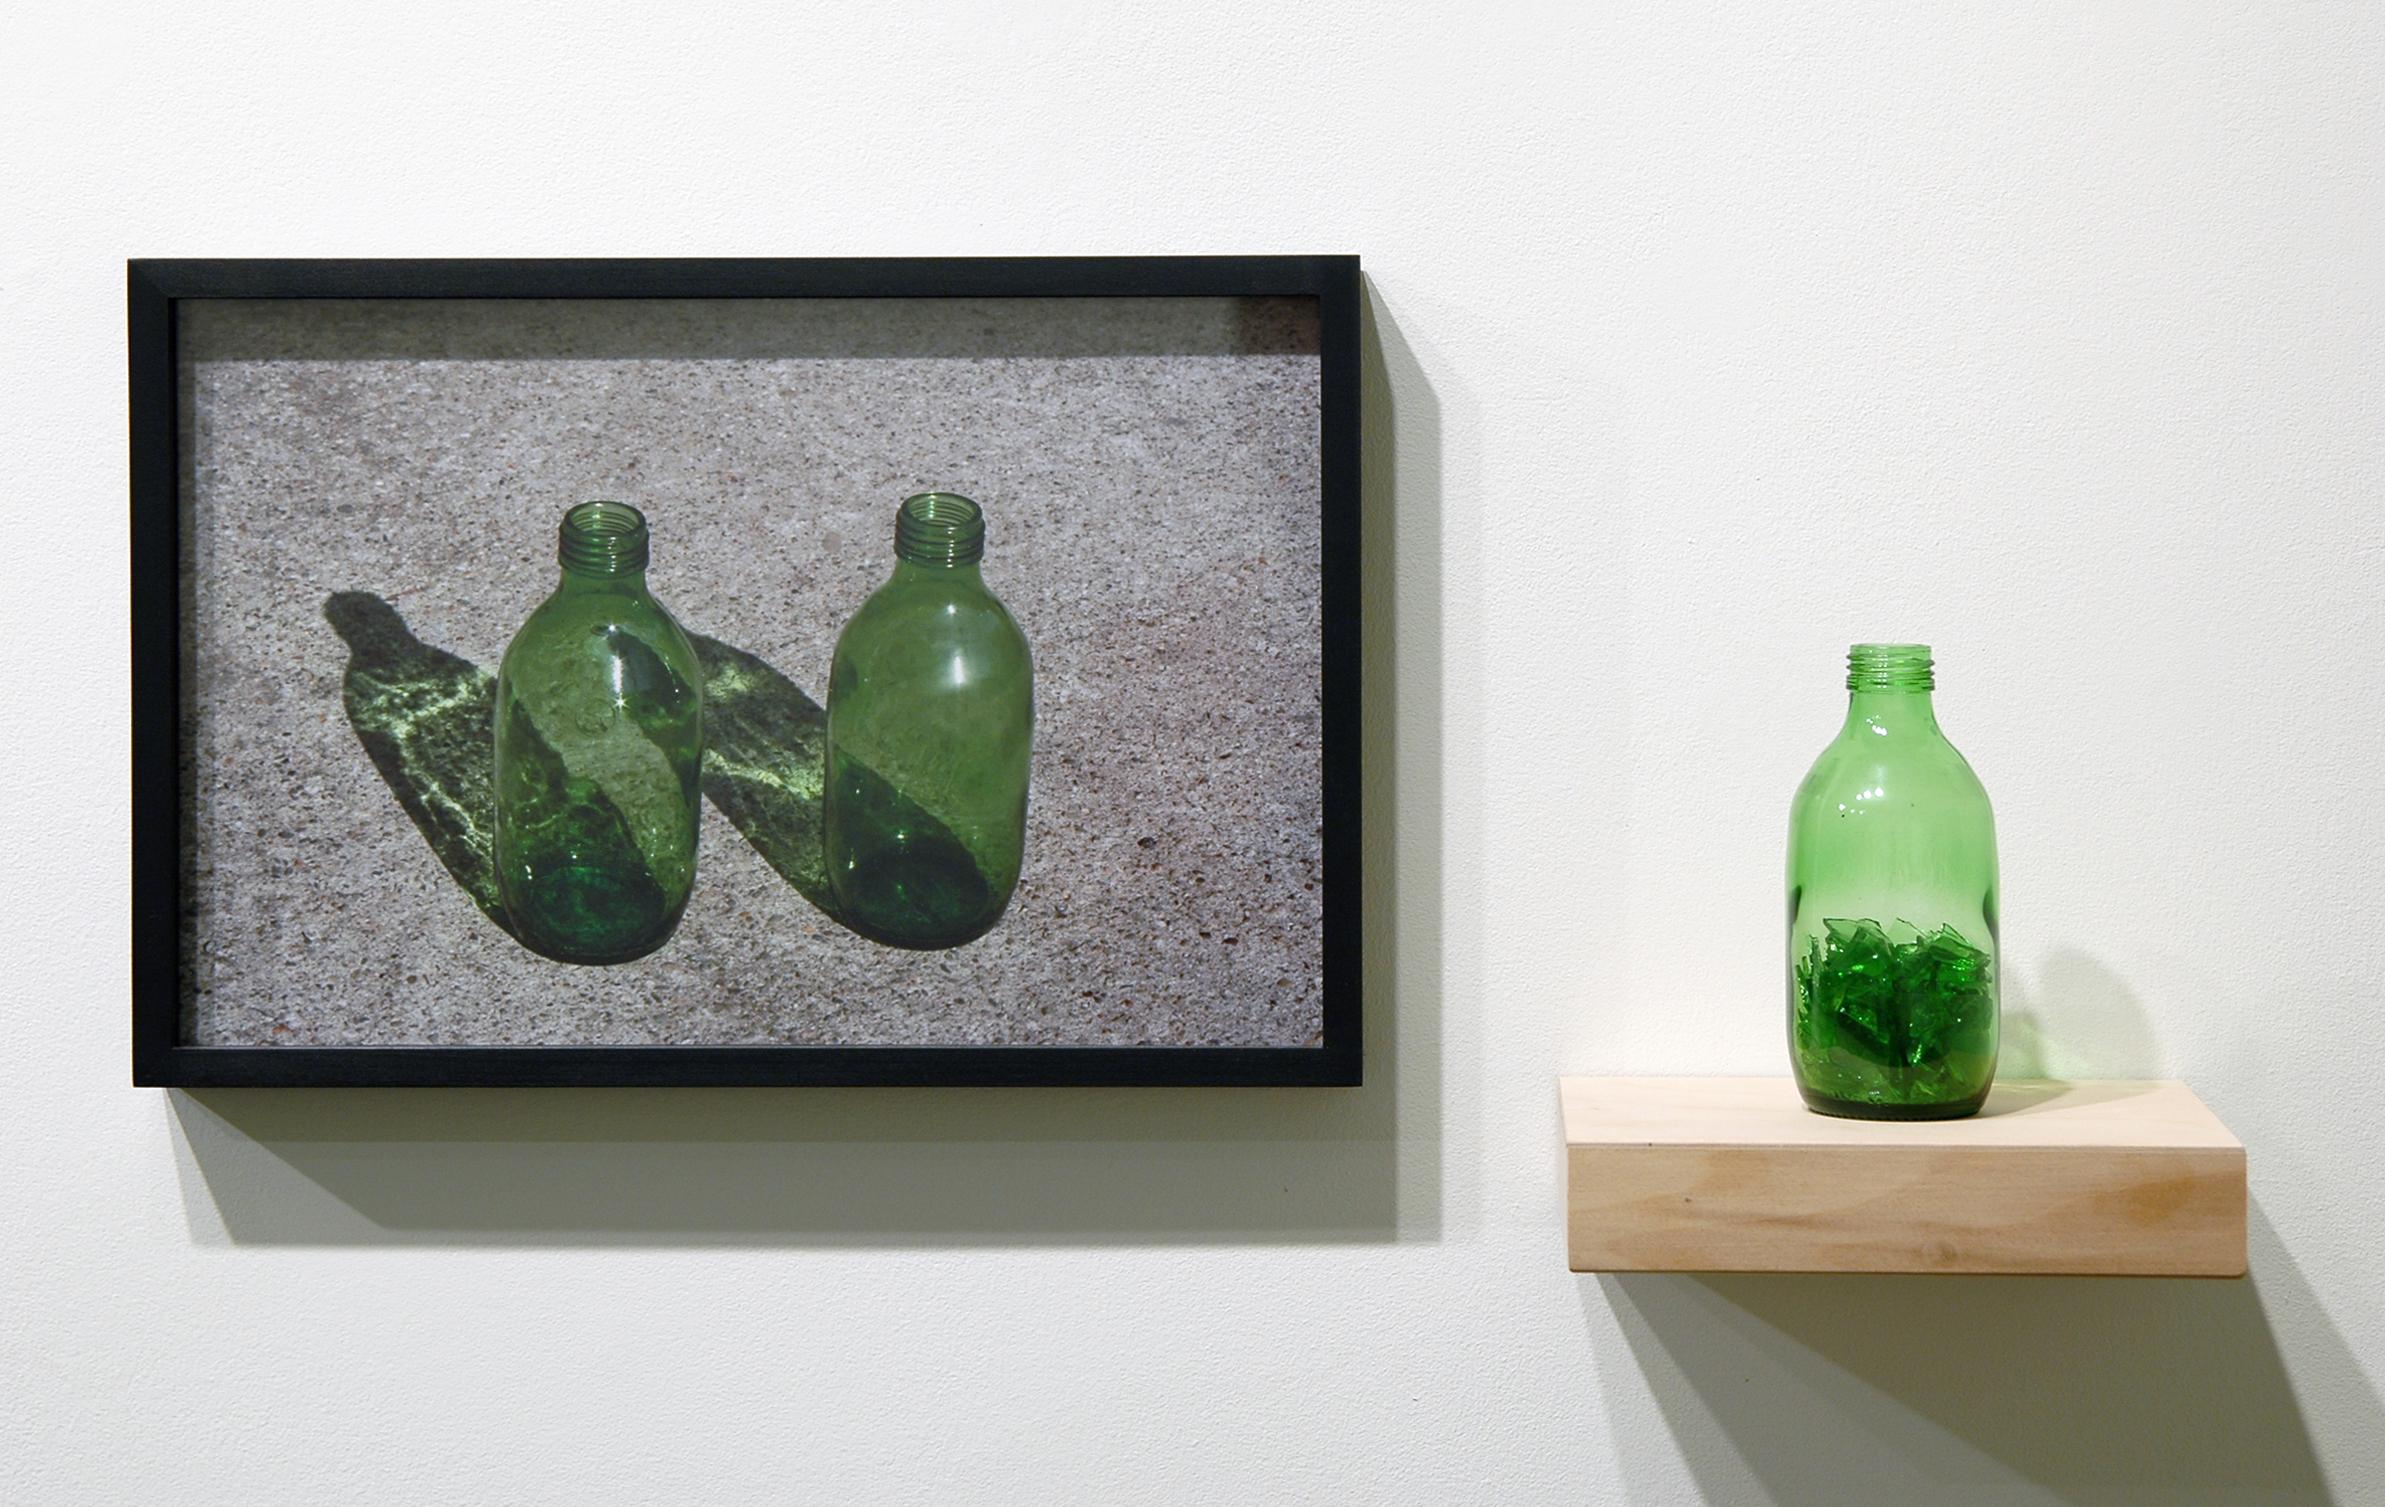 "WITH CINDER BLOCKS WE FLATTEN OUR PHOTOGRAPHS  Pablo Guardiola, Untitled , c-print, glass bottle, broken glass and shelf, 26"" x 12.5"" x 6"", 2013"